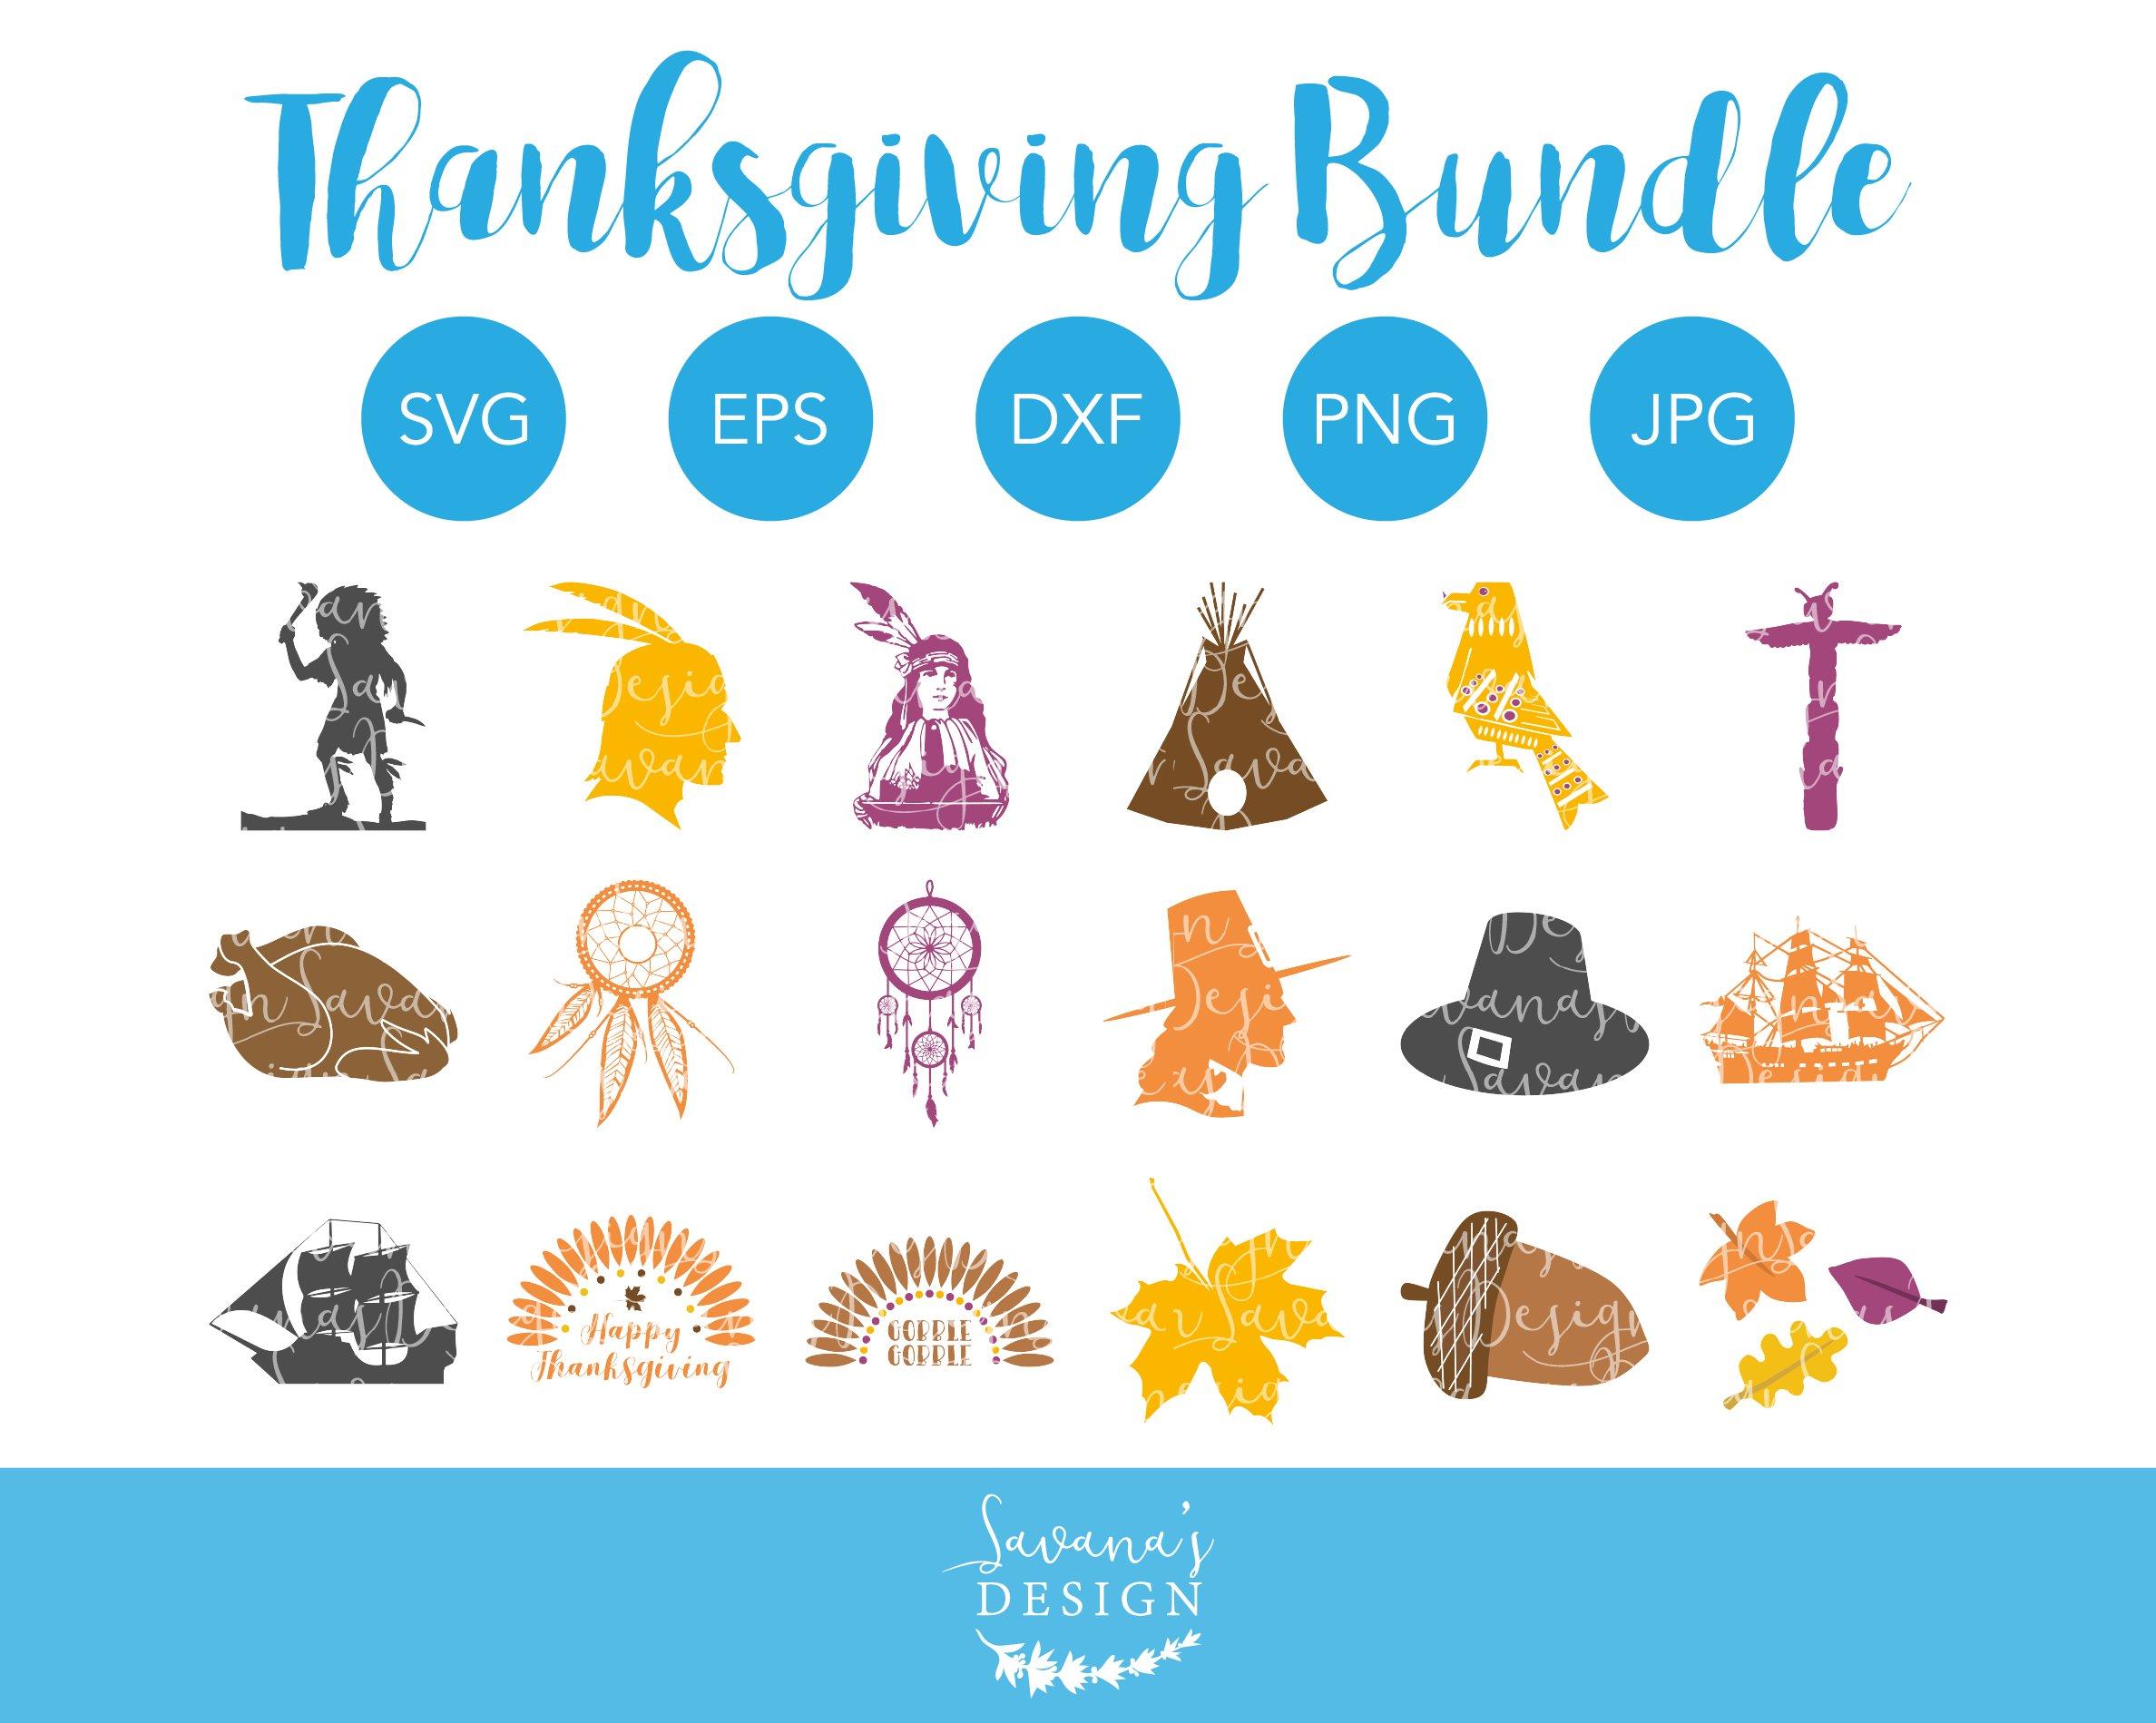 Thanksgiving Svg Bundle Cut Files Pre Designed Illustrator Graphics Creative Market